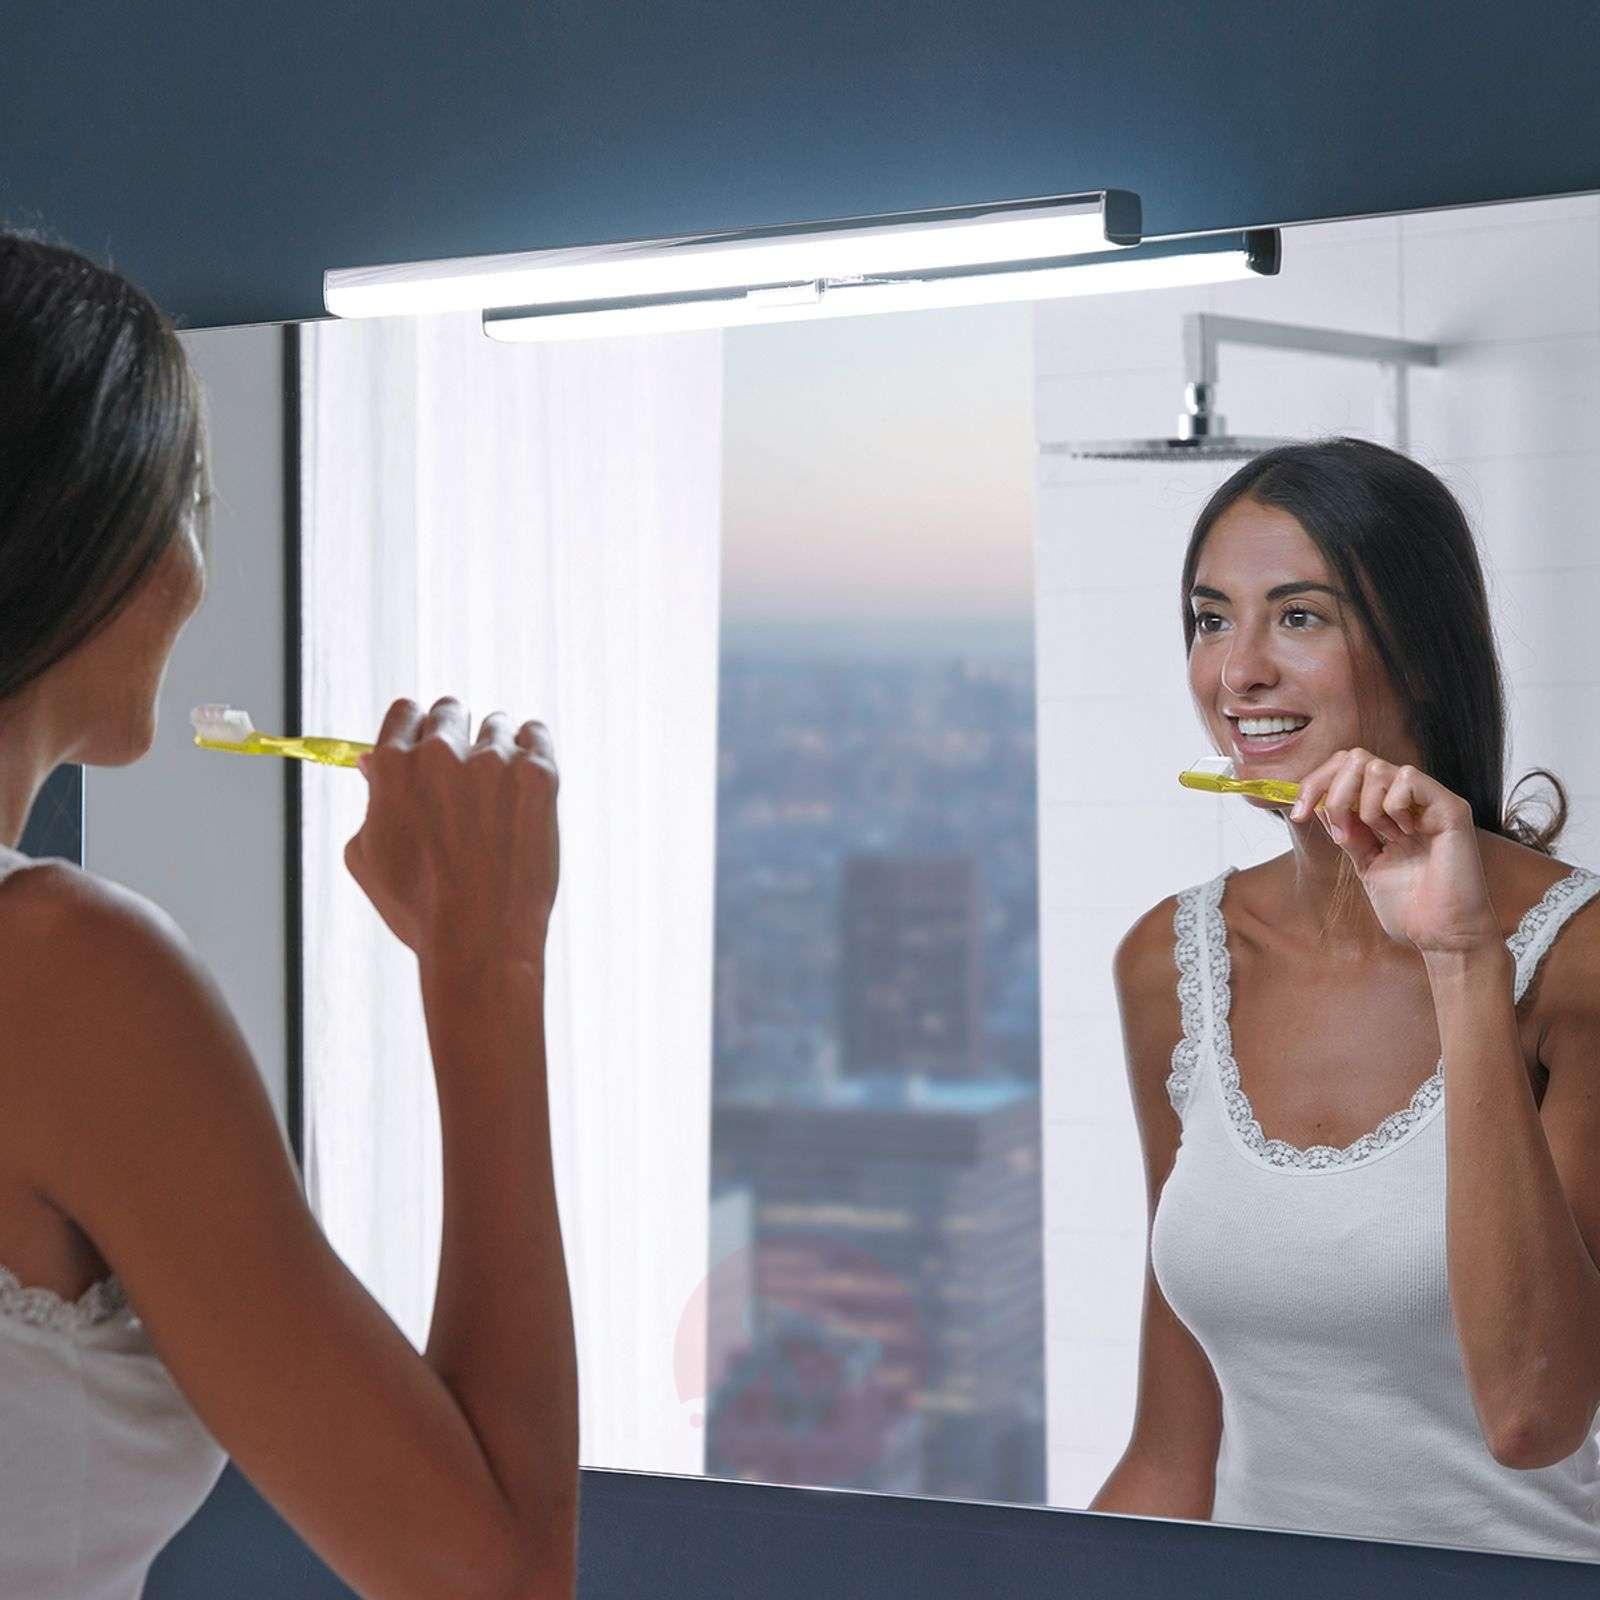 LED bathroom mirror light Atlaswith remote control-3052037-06